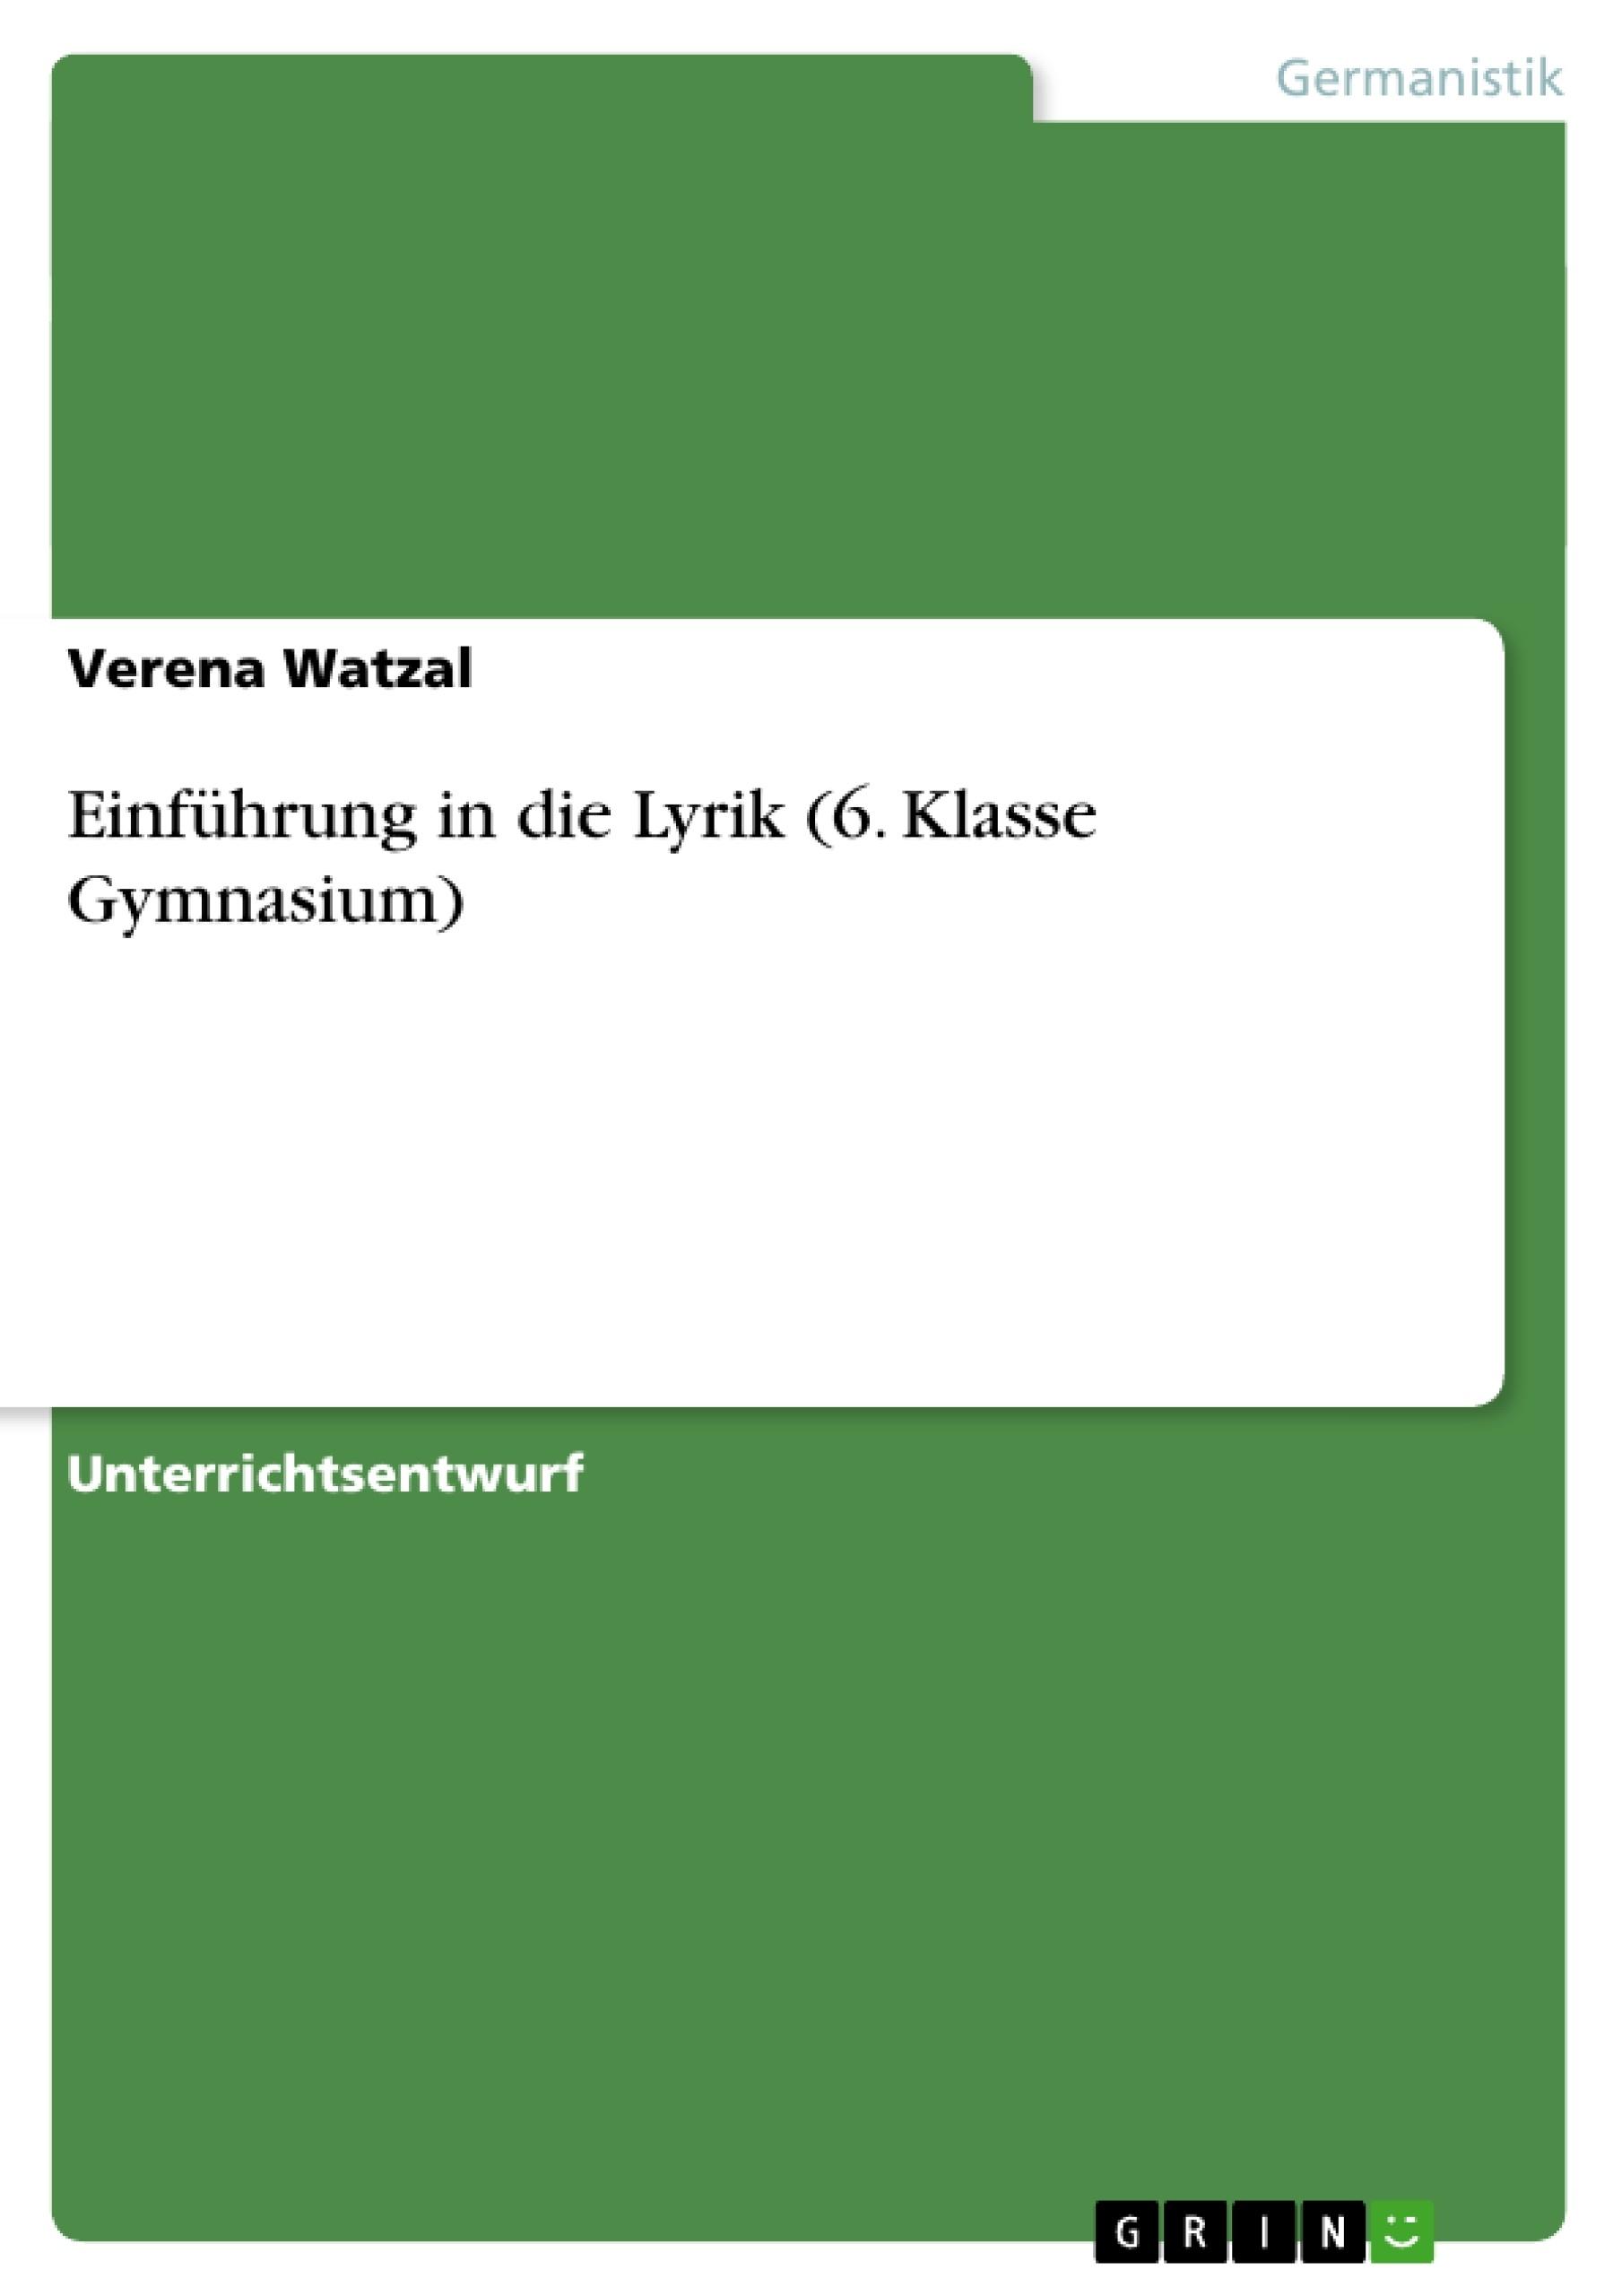 Titel: Einführung in die Lyrik (6. Klasse Gymnasium)